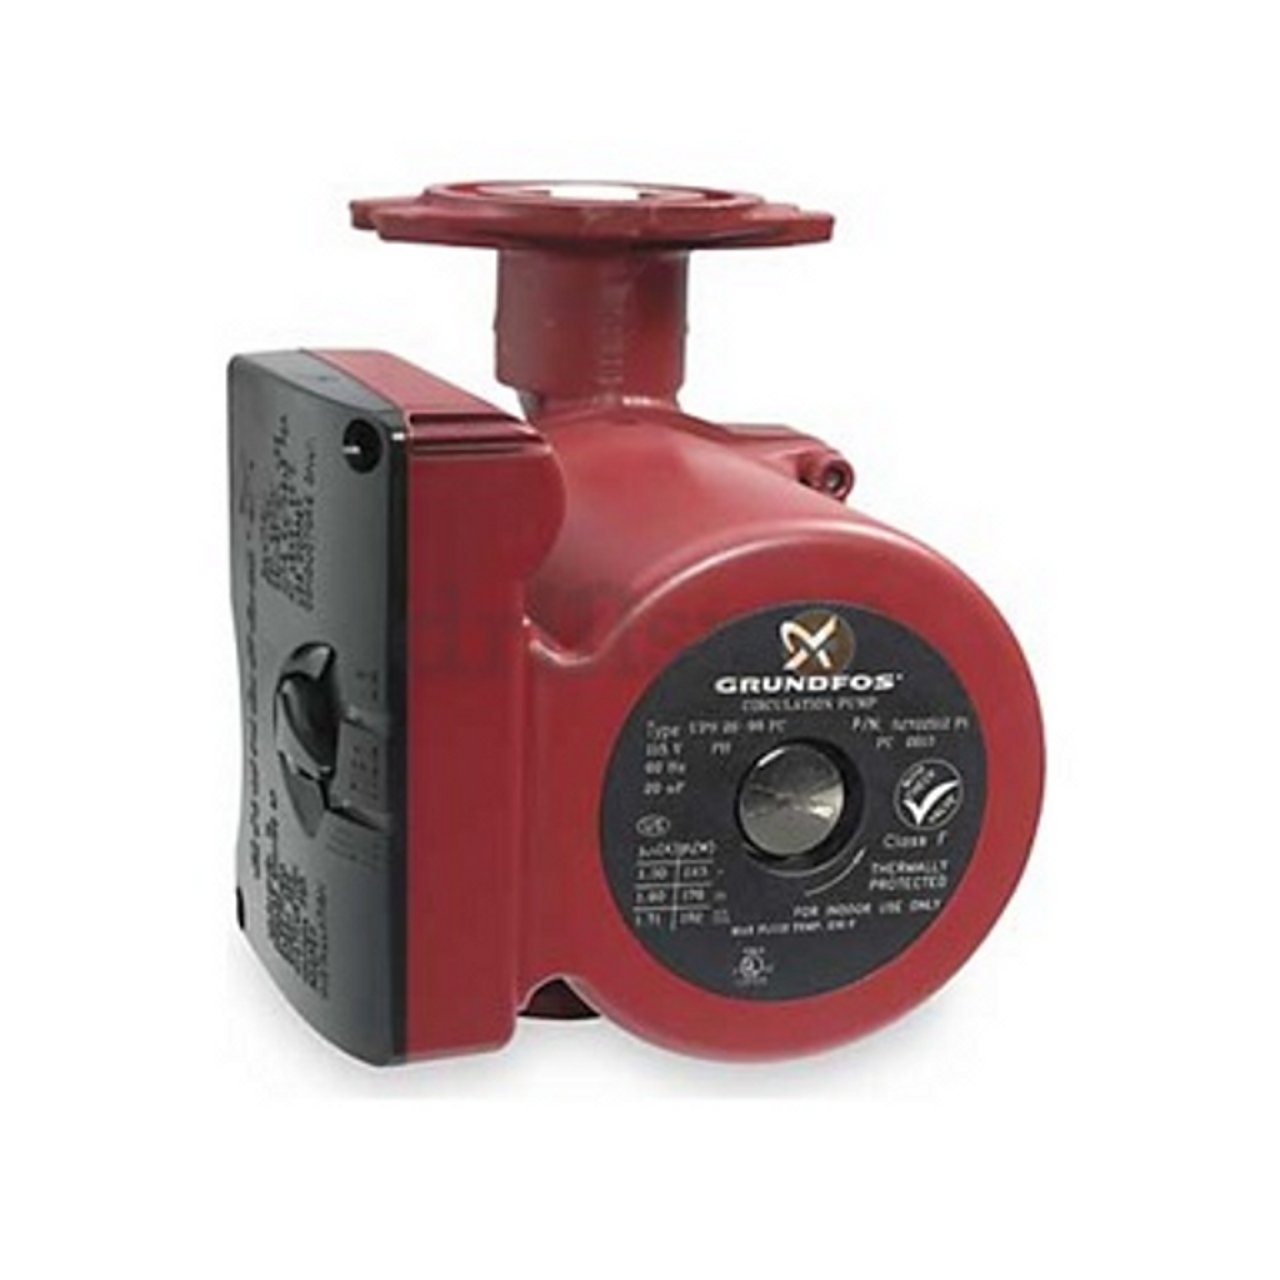 Grundfos 52722512 3-Speed 1/6 Horsepower Circulator Pump with Flow Check by Grundfos